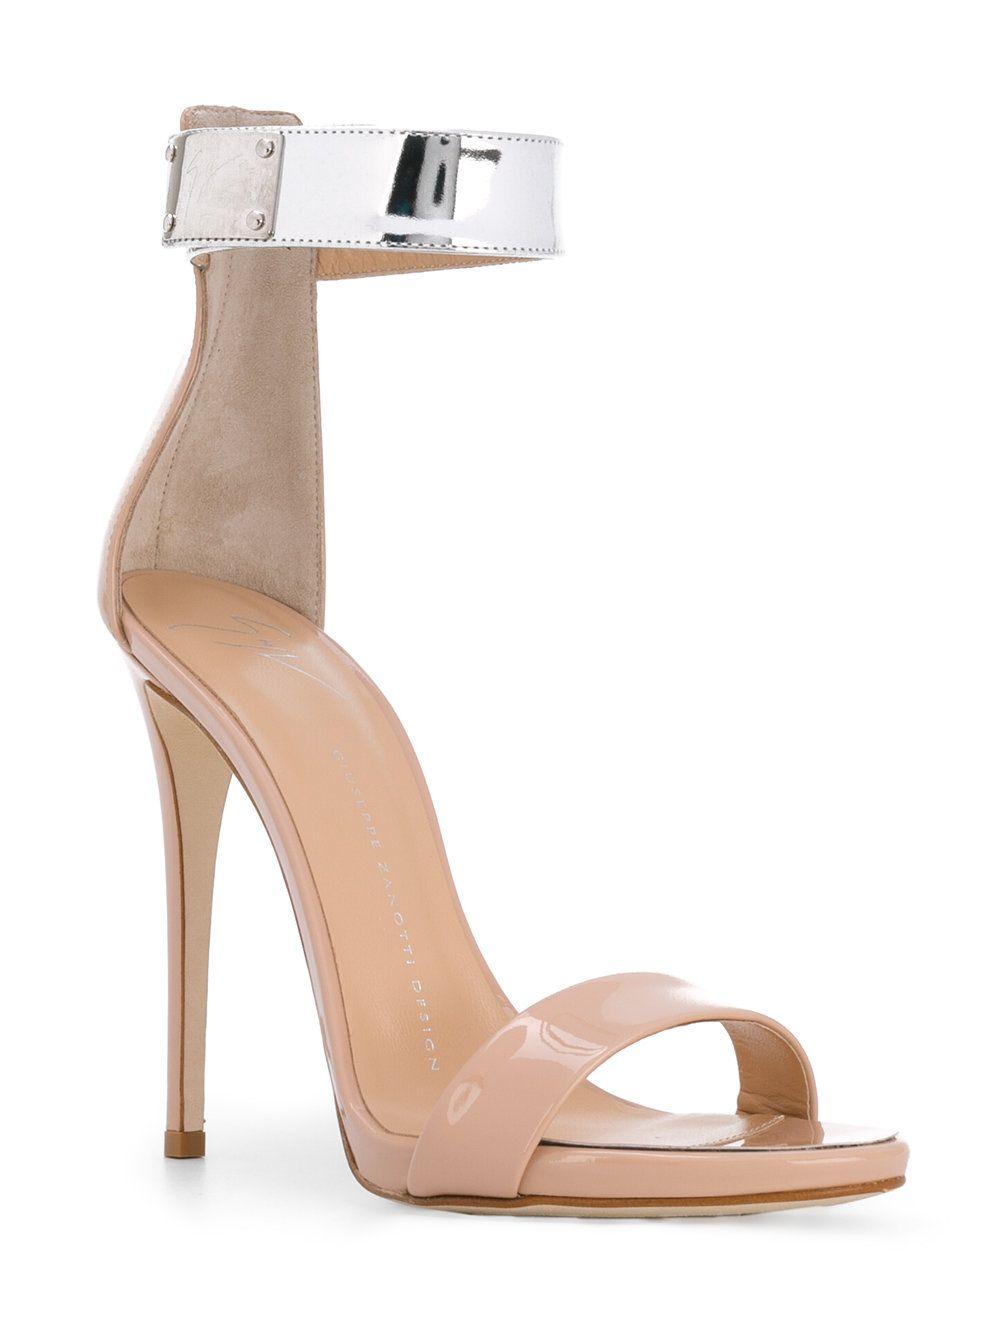 7f039dc440c14 Giuseppe Zanotti Design Cam Party Ankle Strap Sandals - Farfetch ...